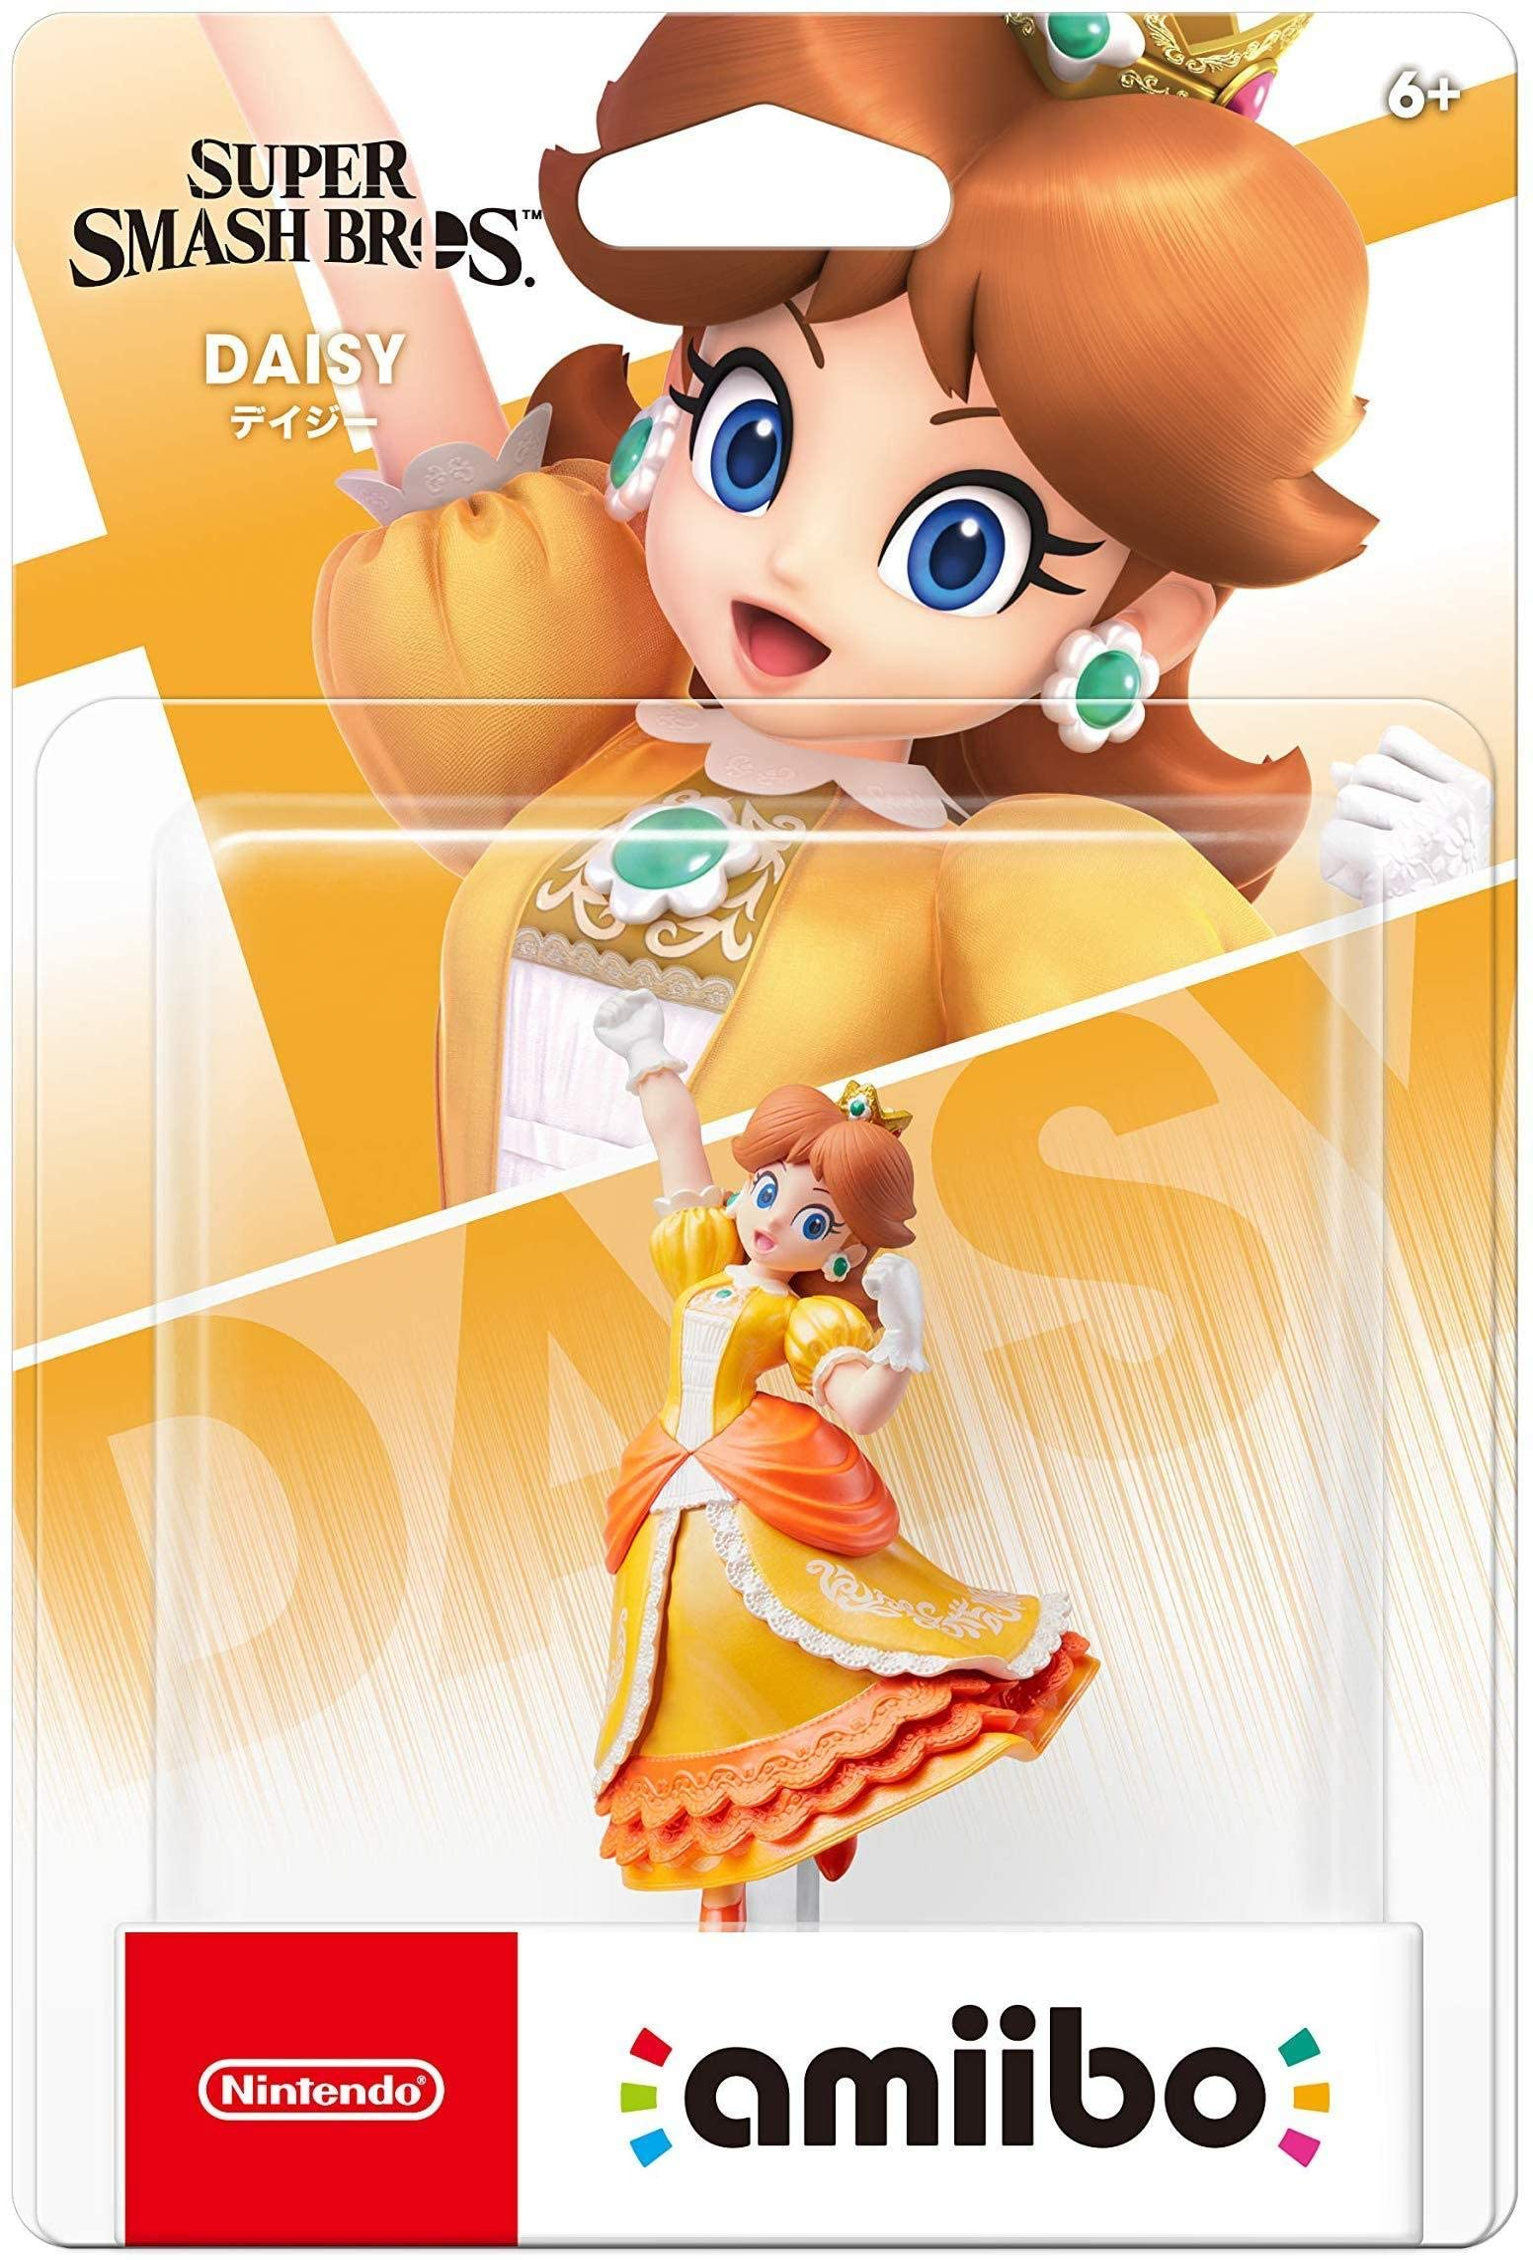 Amazon.com: Nintendo Amiibo - Daisy (Ssbu) - Switch: Video Games